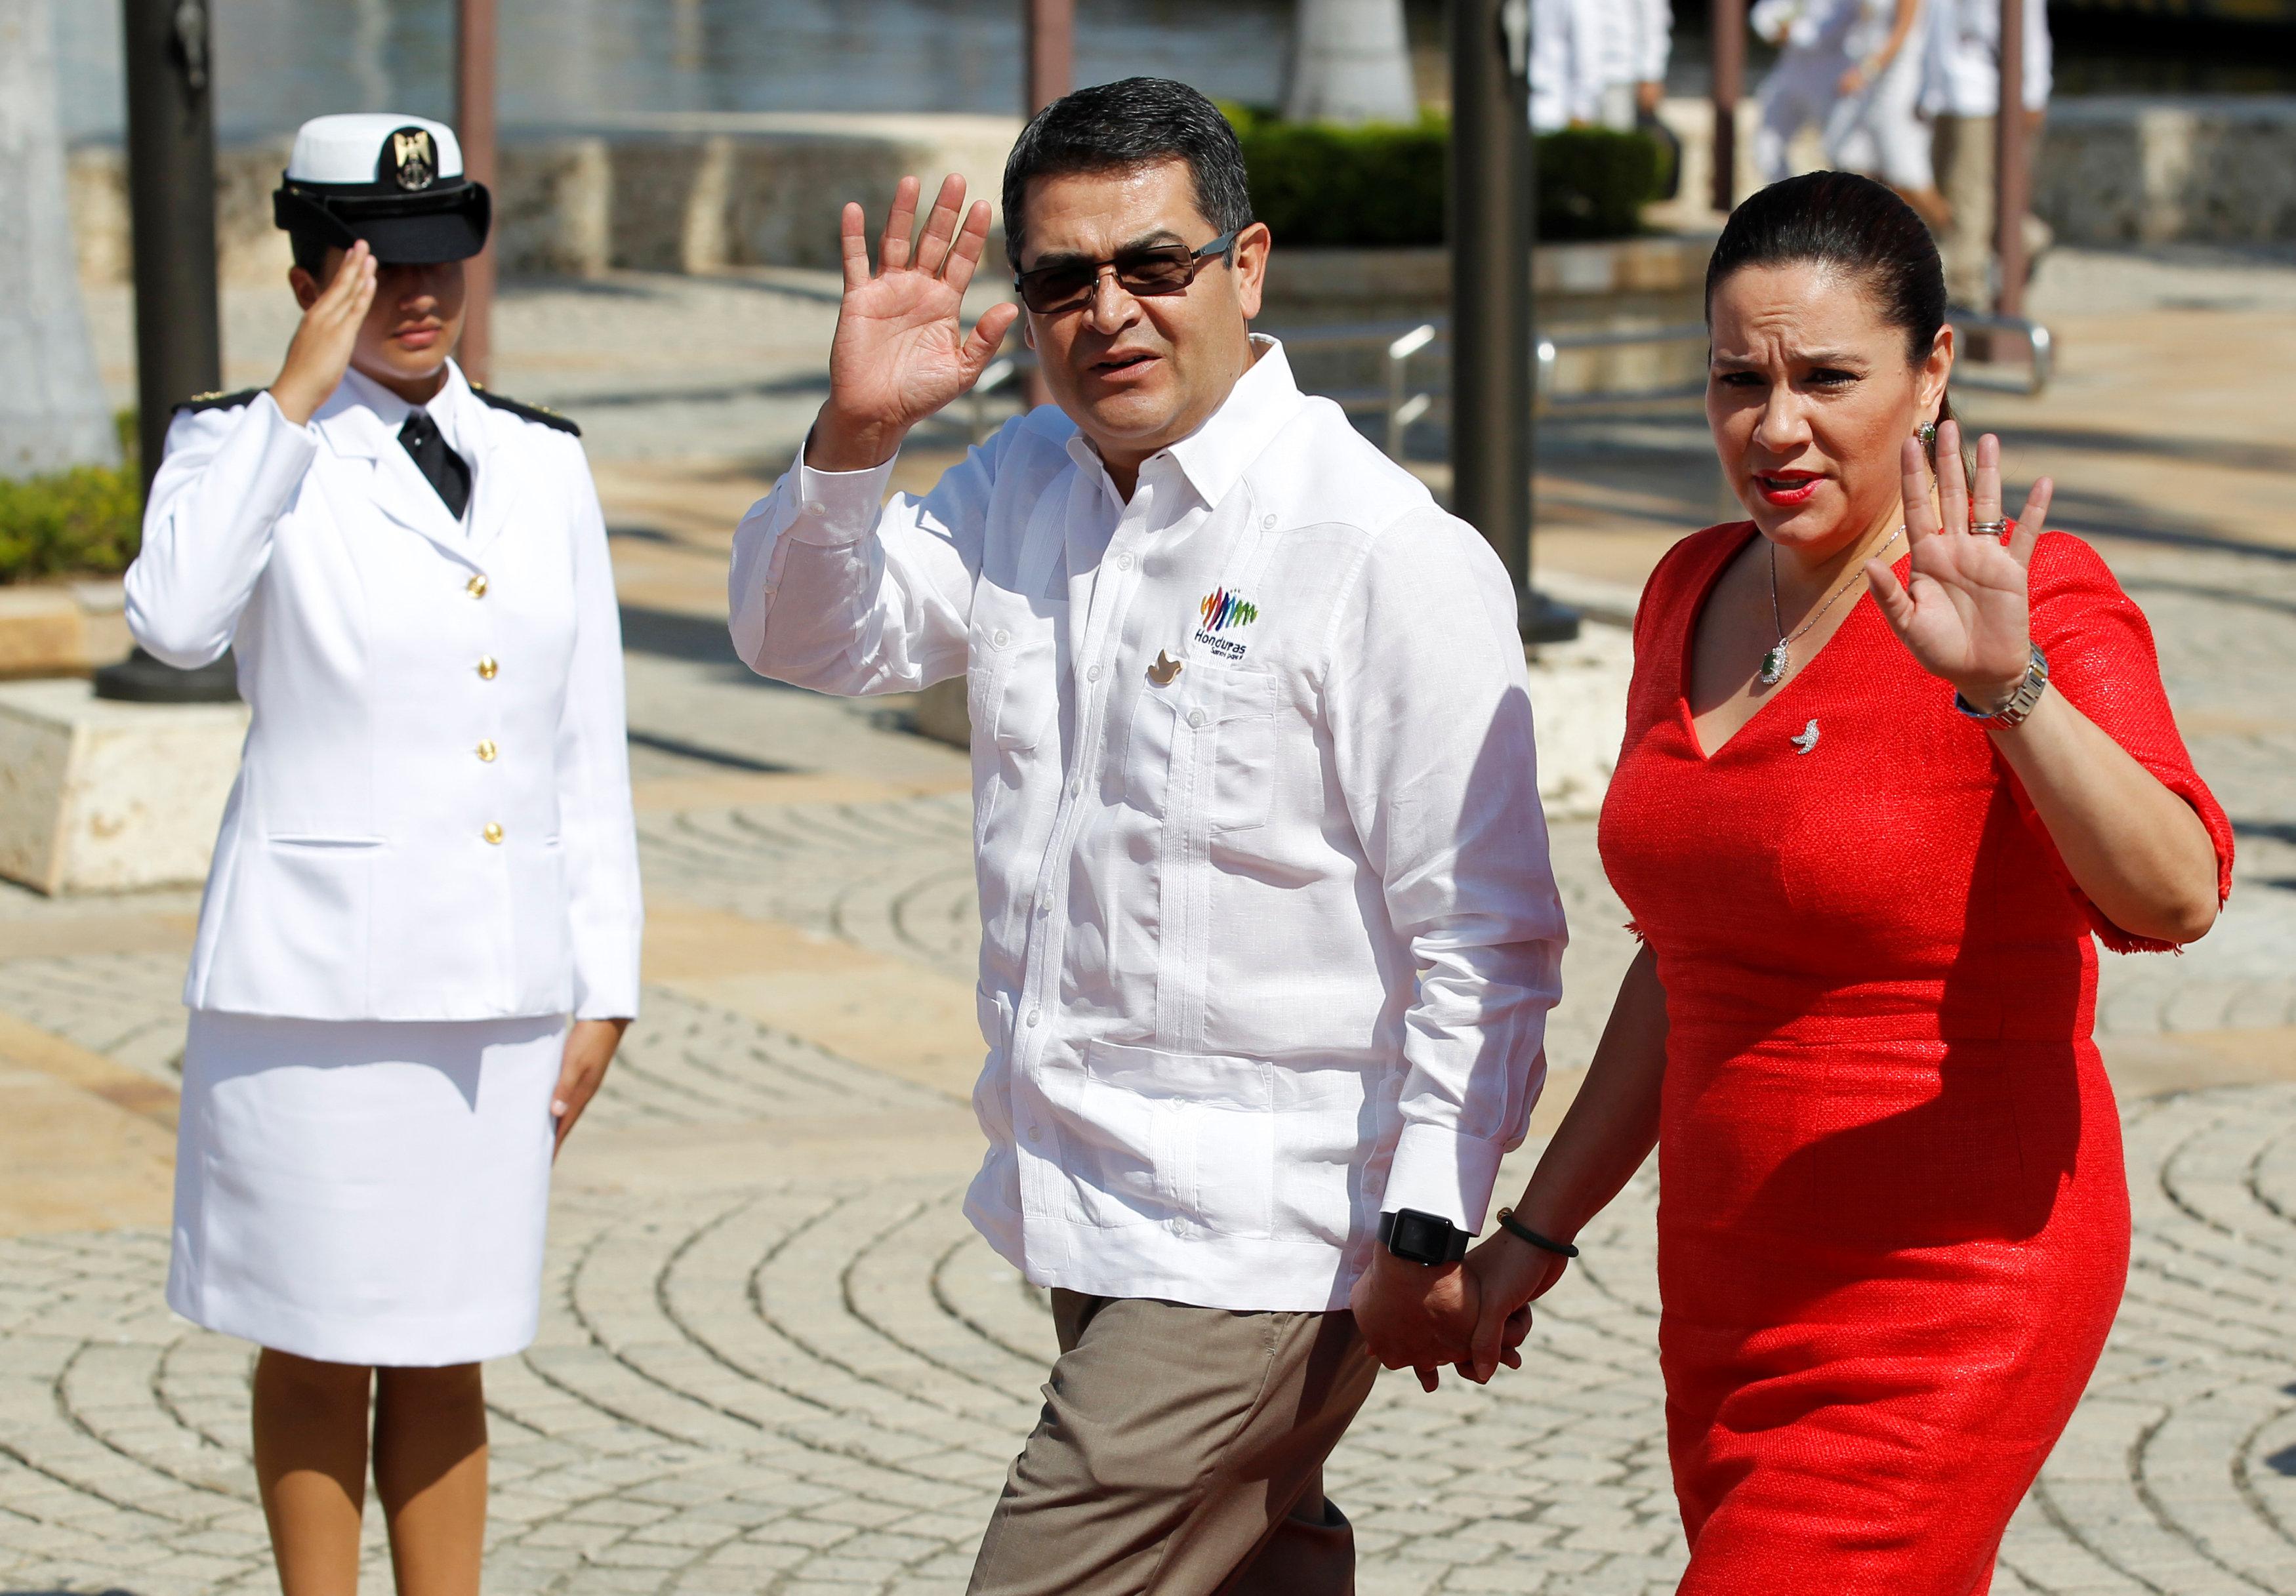 Gobernantes de Iberoamérica firmarán pacto por la juventud